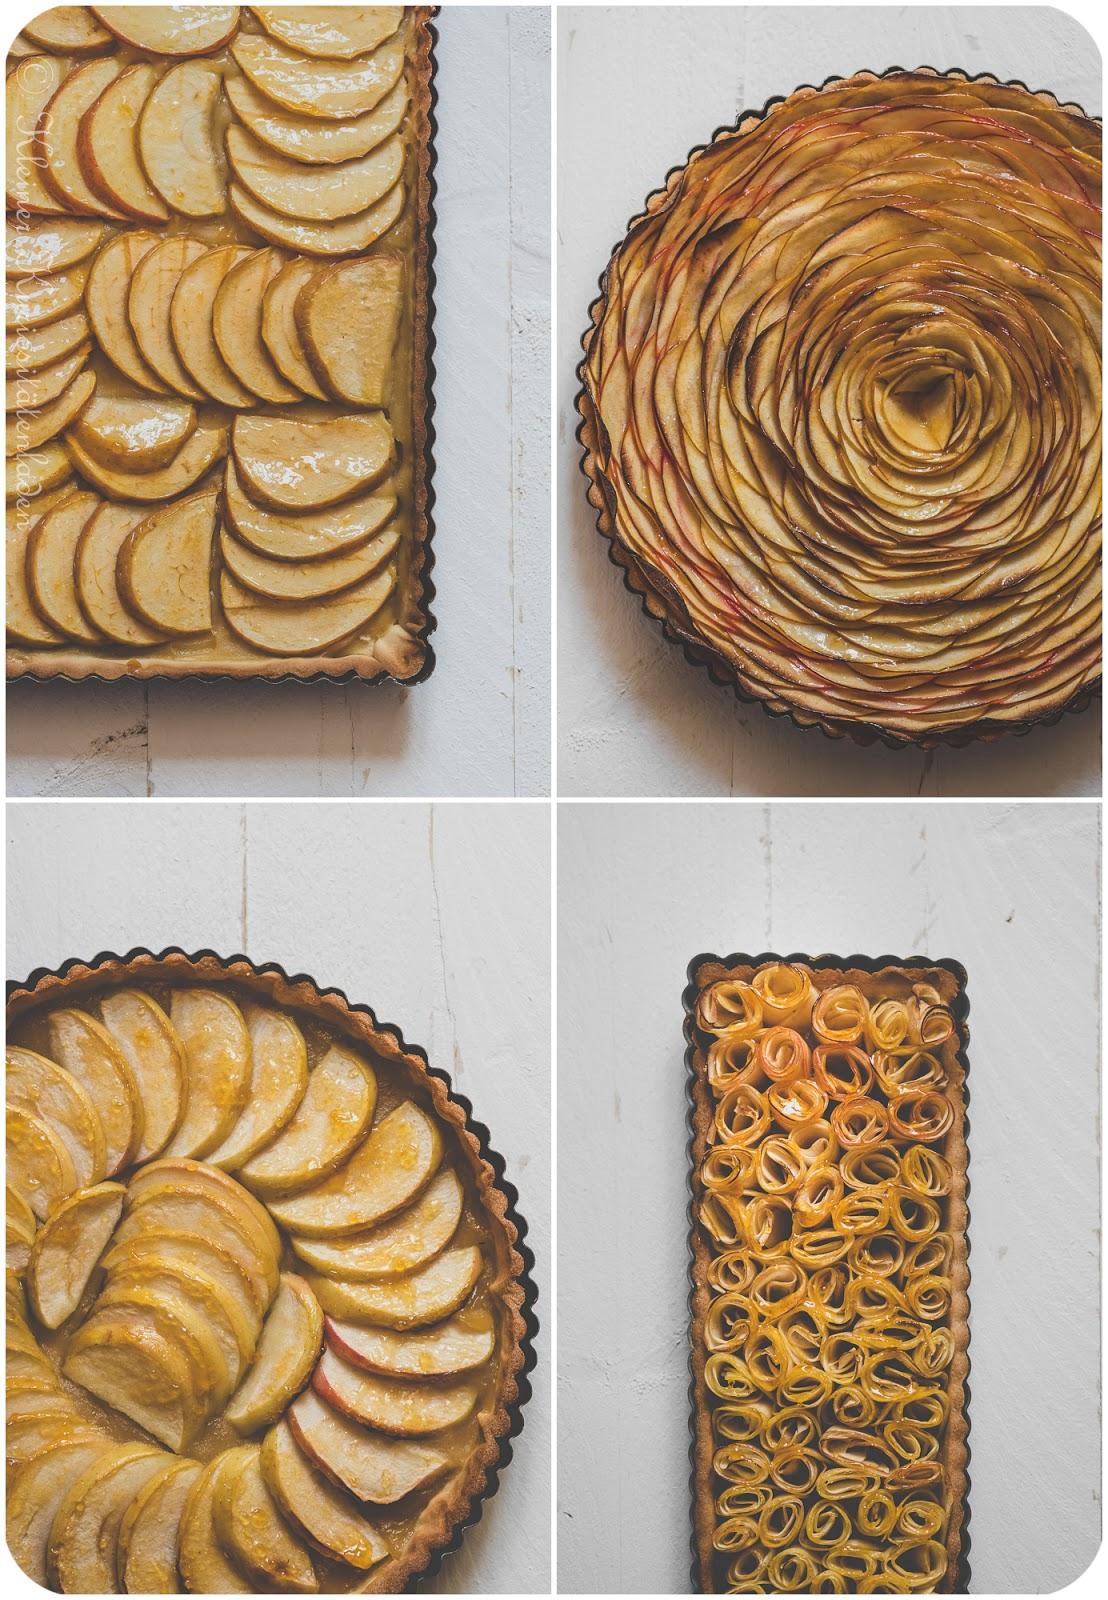 Tarte aux Pommes | Apfeltarte, 4x anders